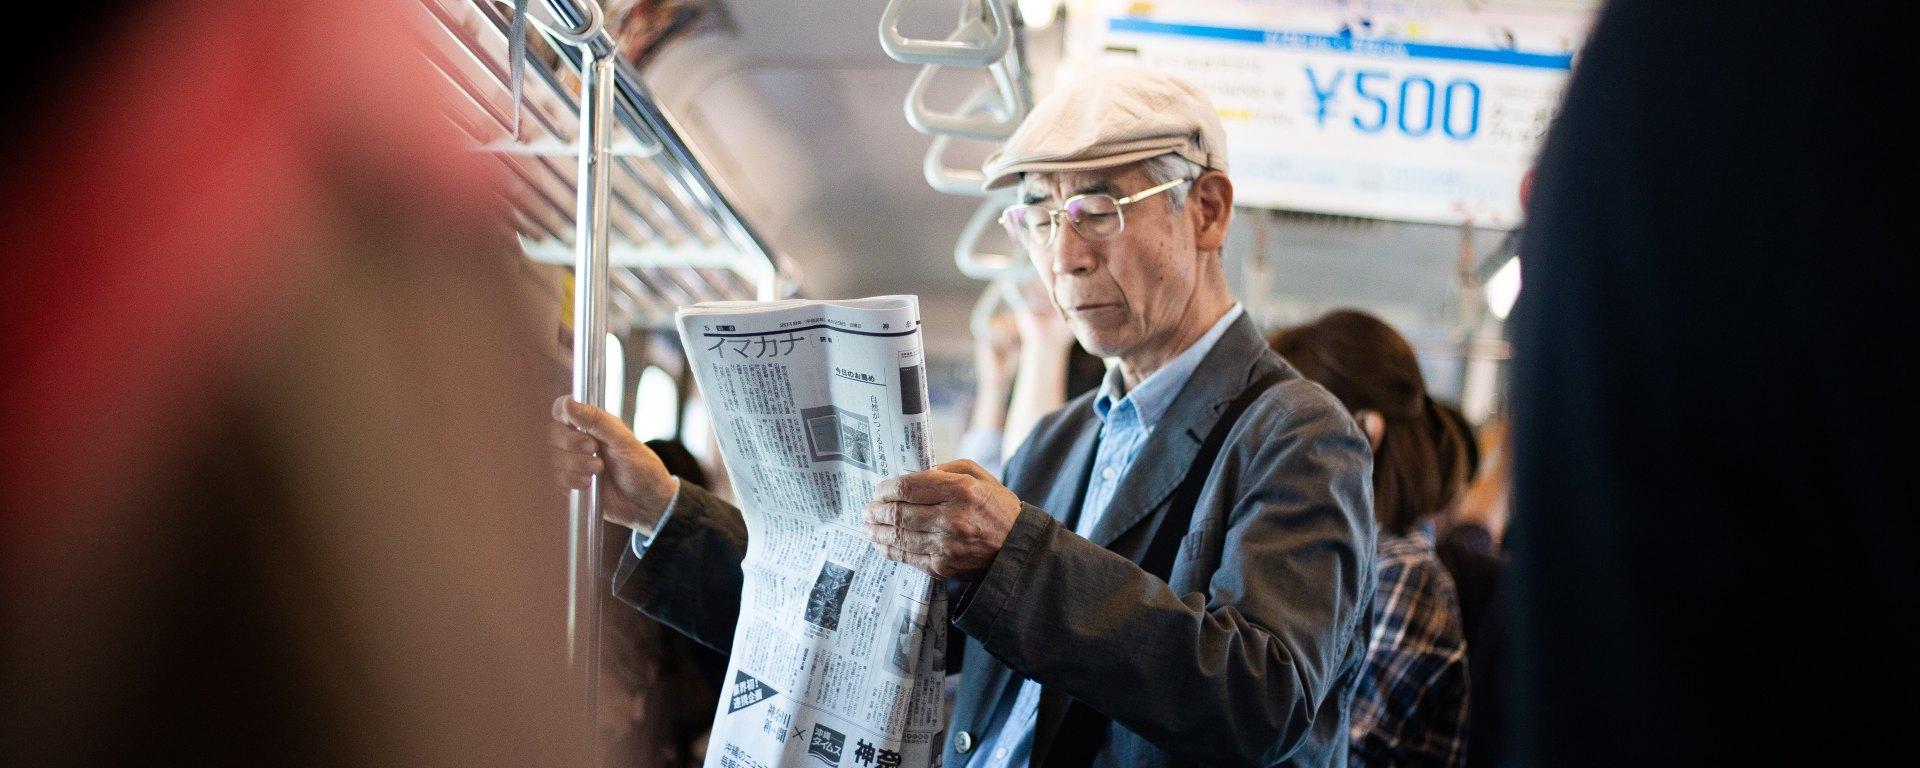 man reading a Japanese newspaper